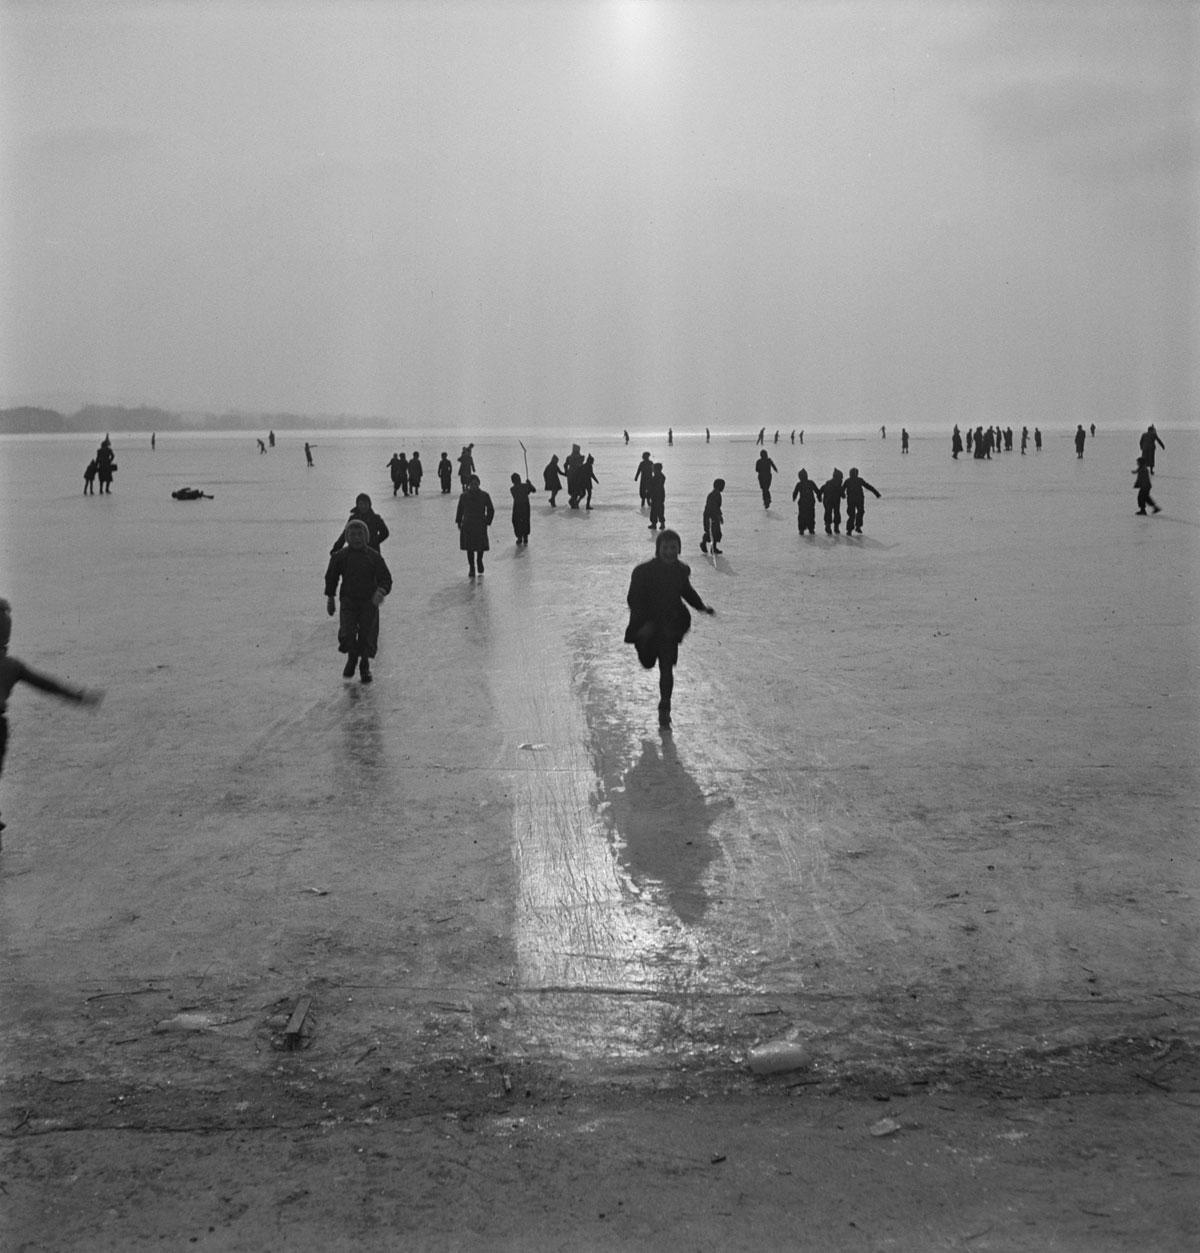 Anon. 'Frozen Lake Biel' 1941 © Swiss National Museum